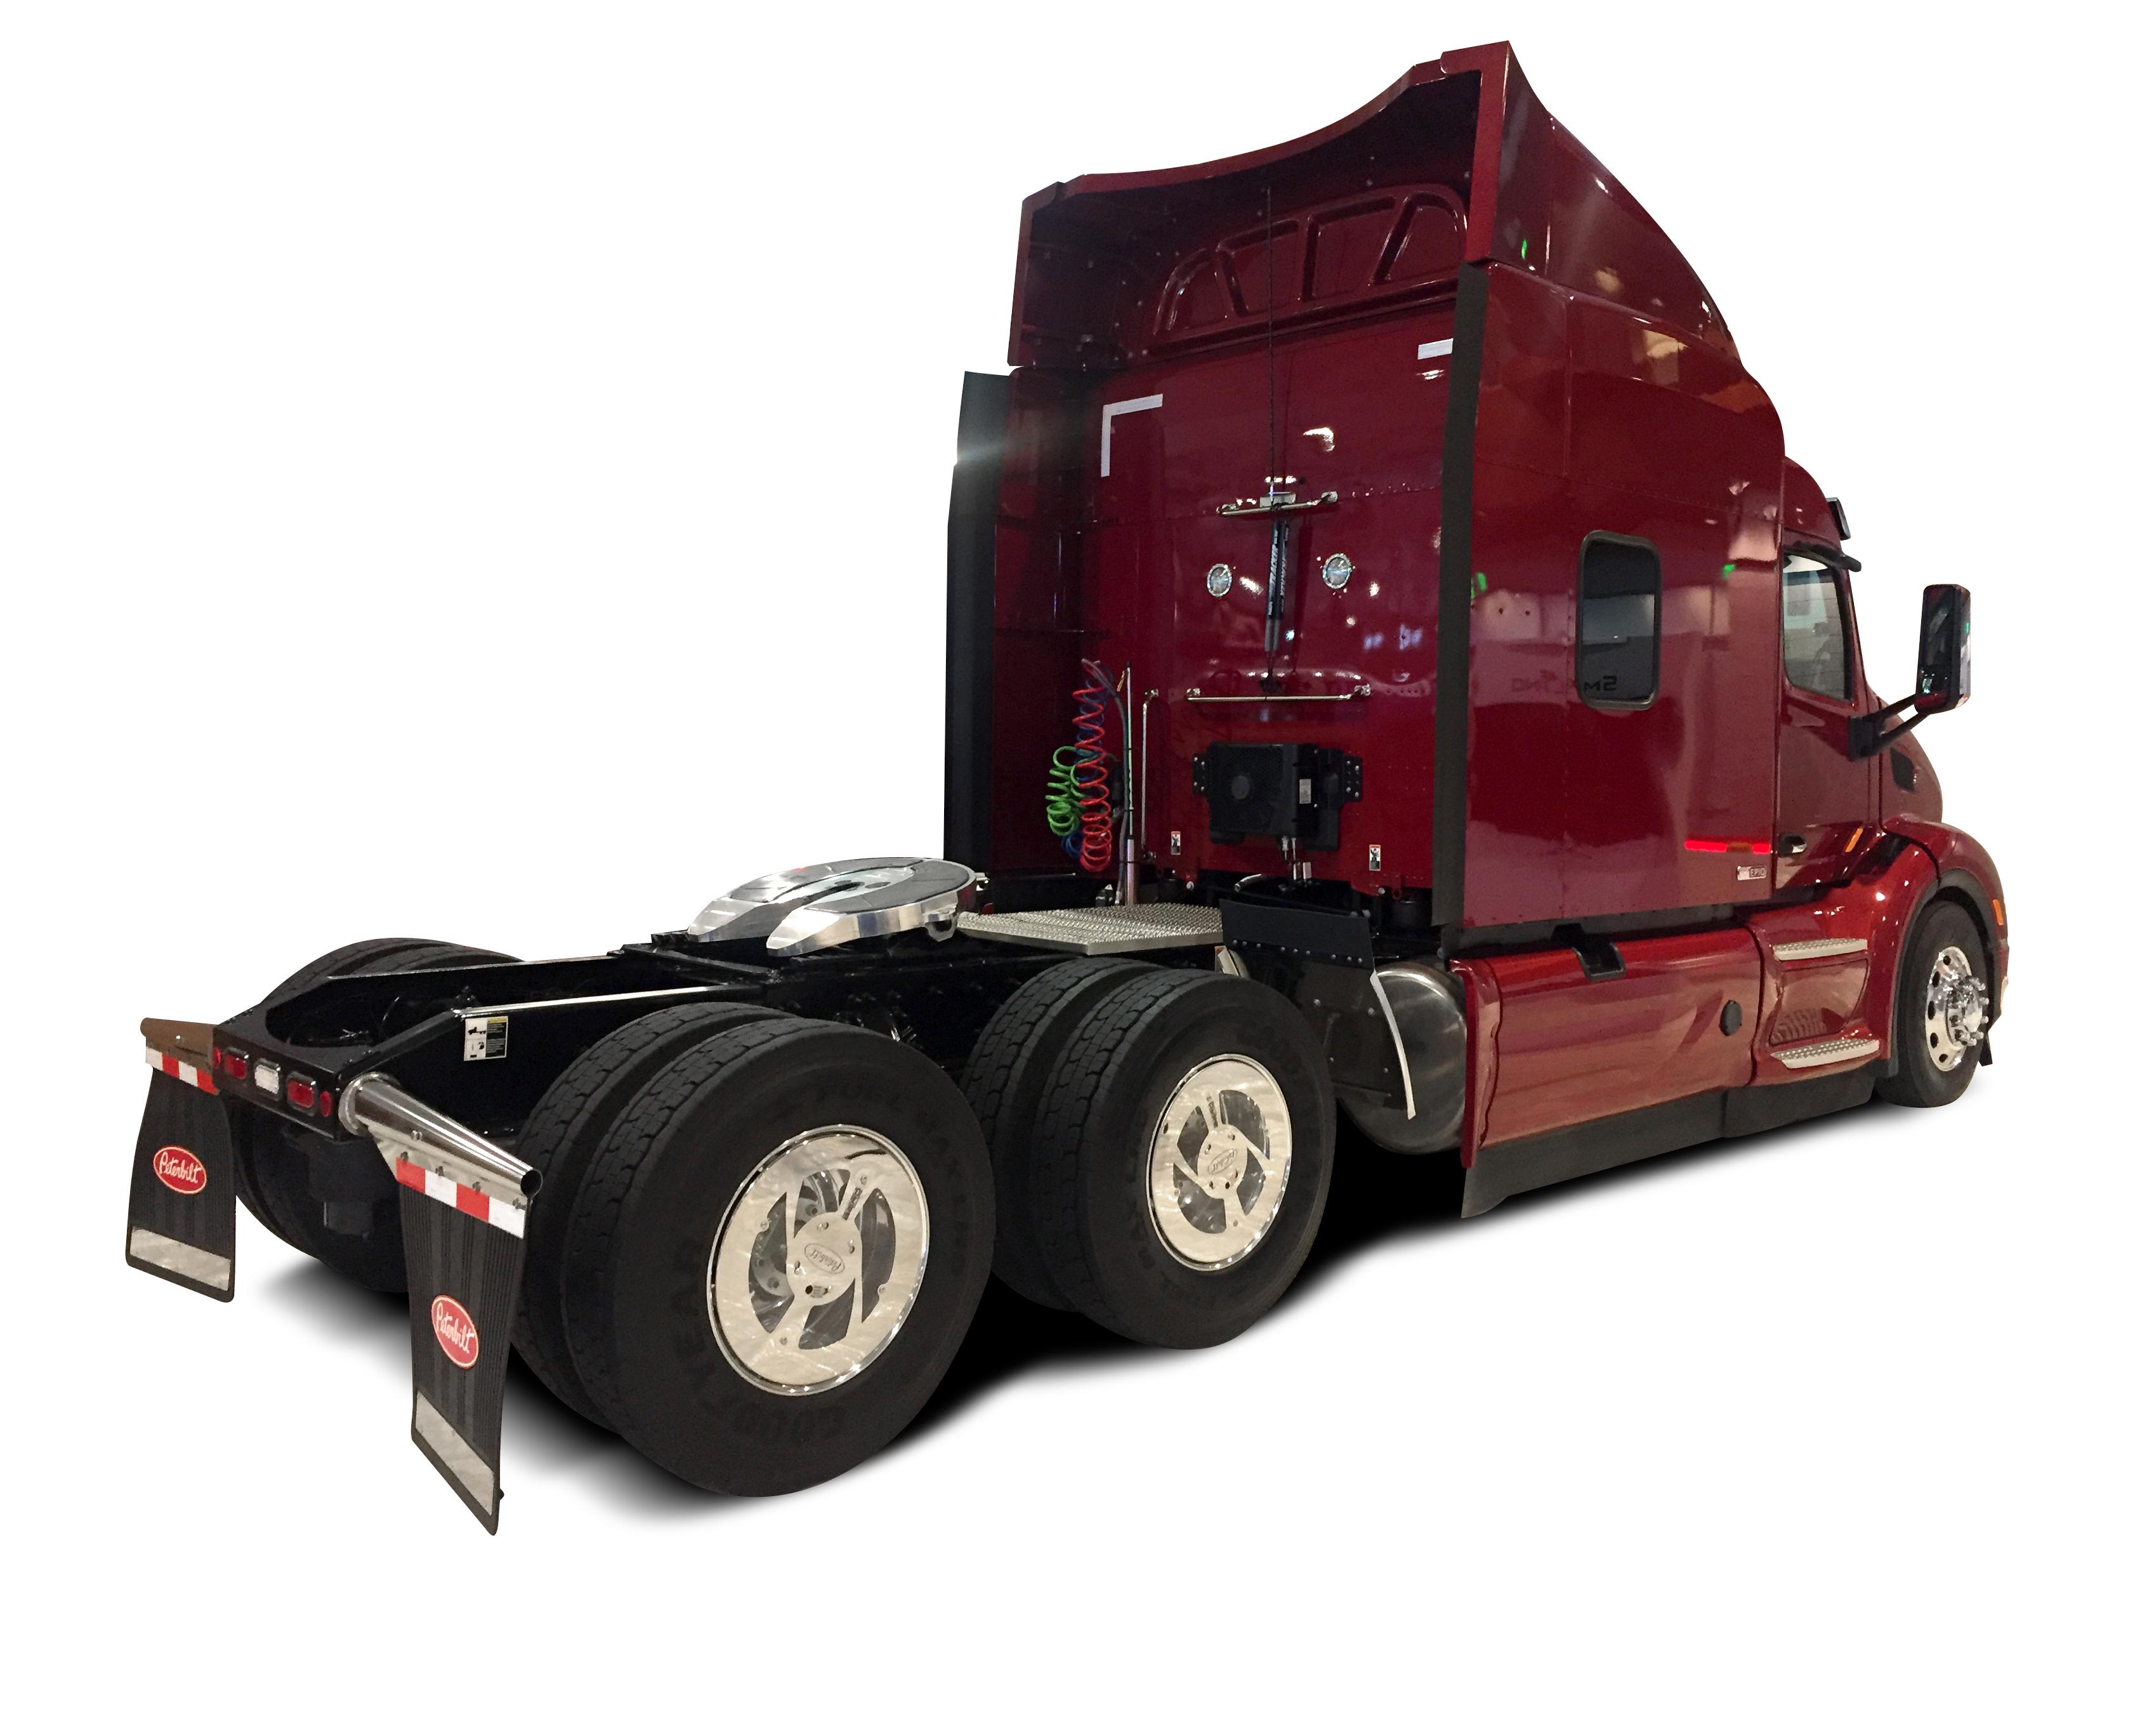 2017 Peterbilt 579 >> New RealWheels Twist & Lock Aero Wheel Covers Now Offered ...